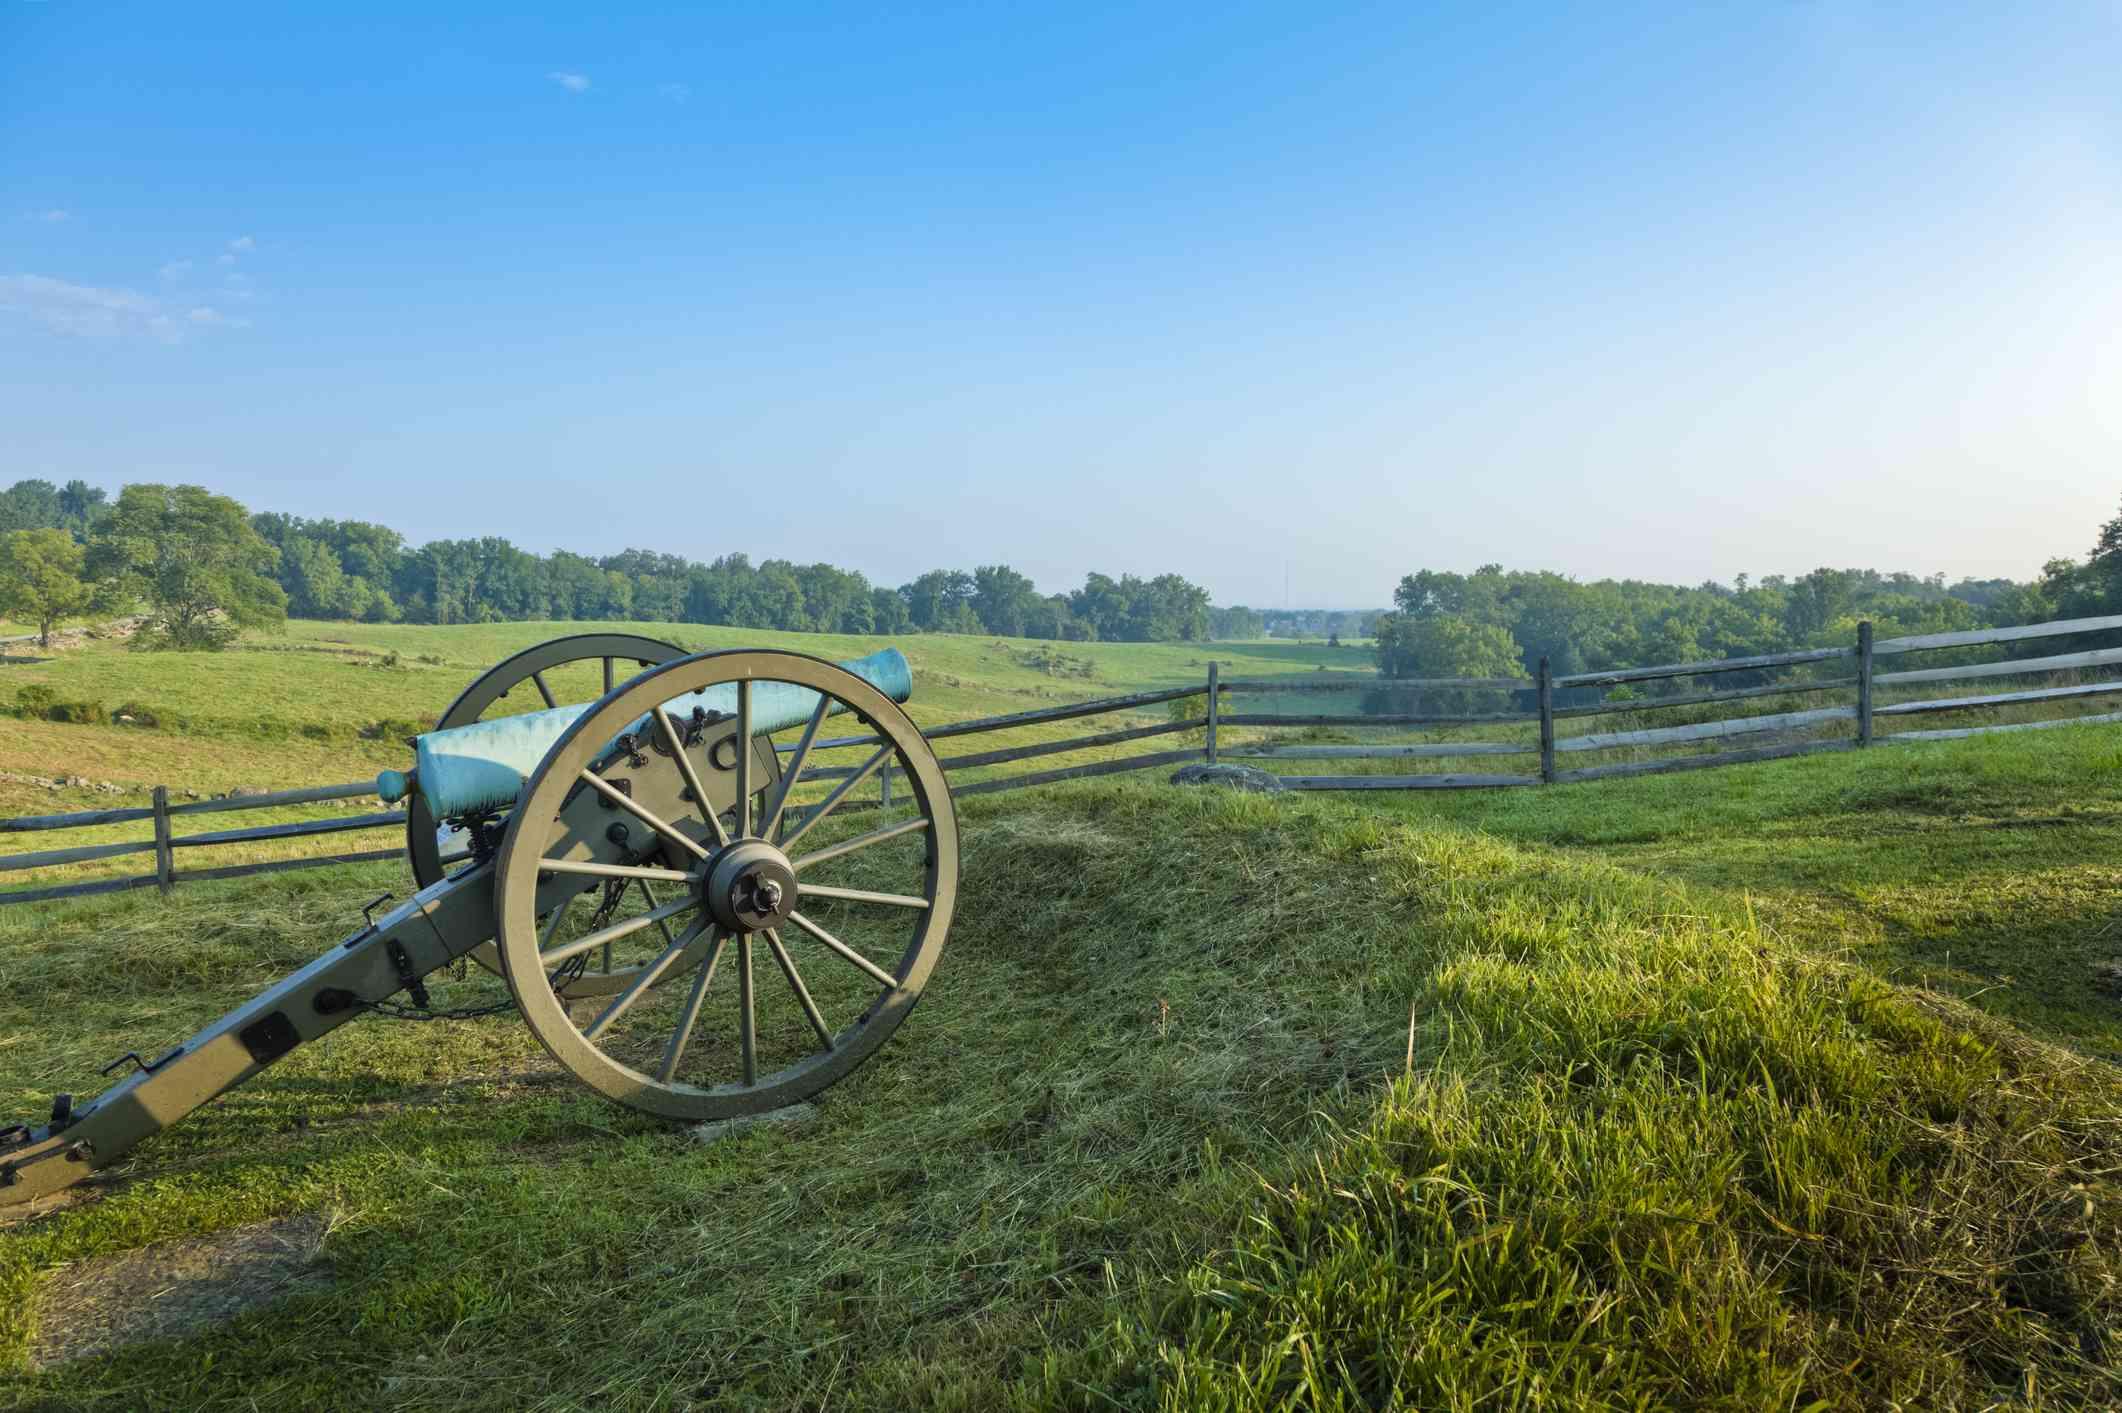 Civil war-era cannon at the Gettysburg National Military Park